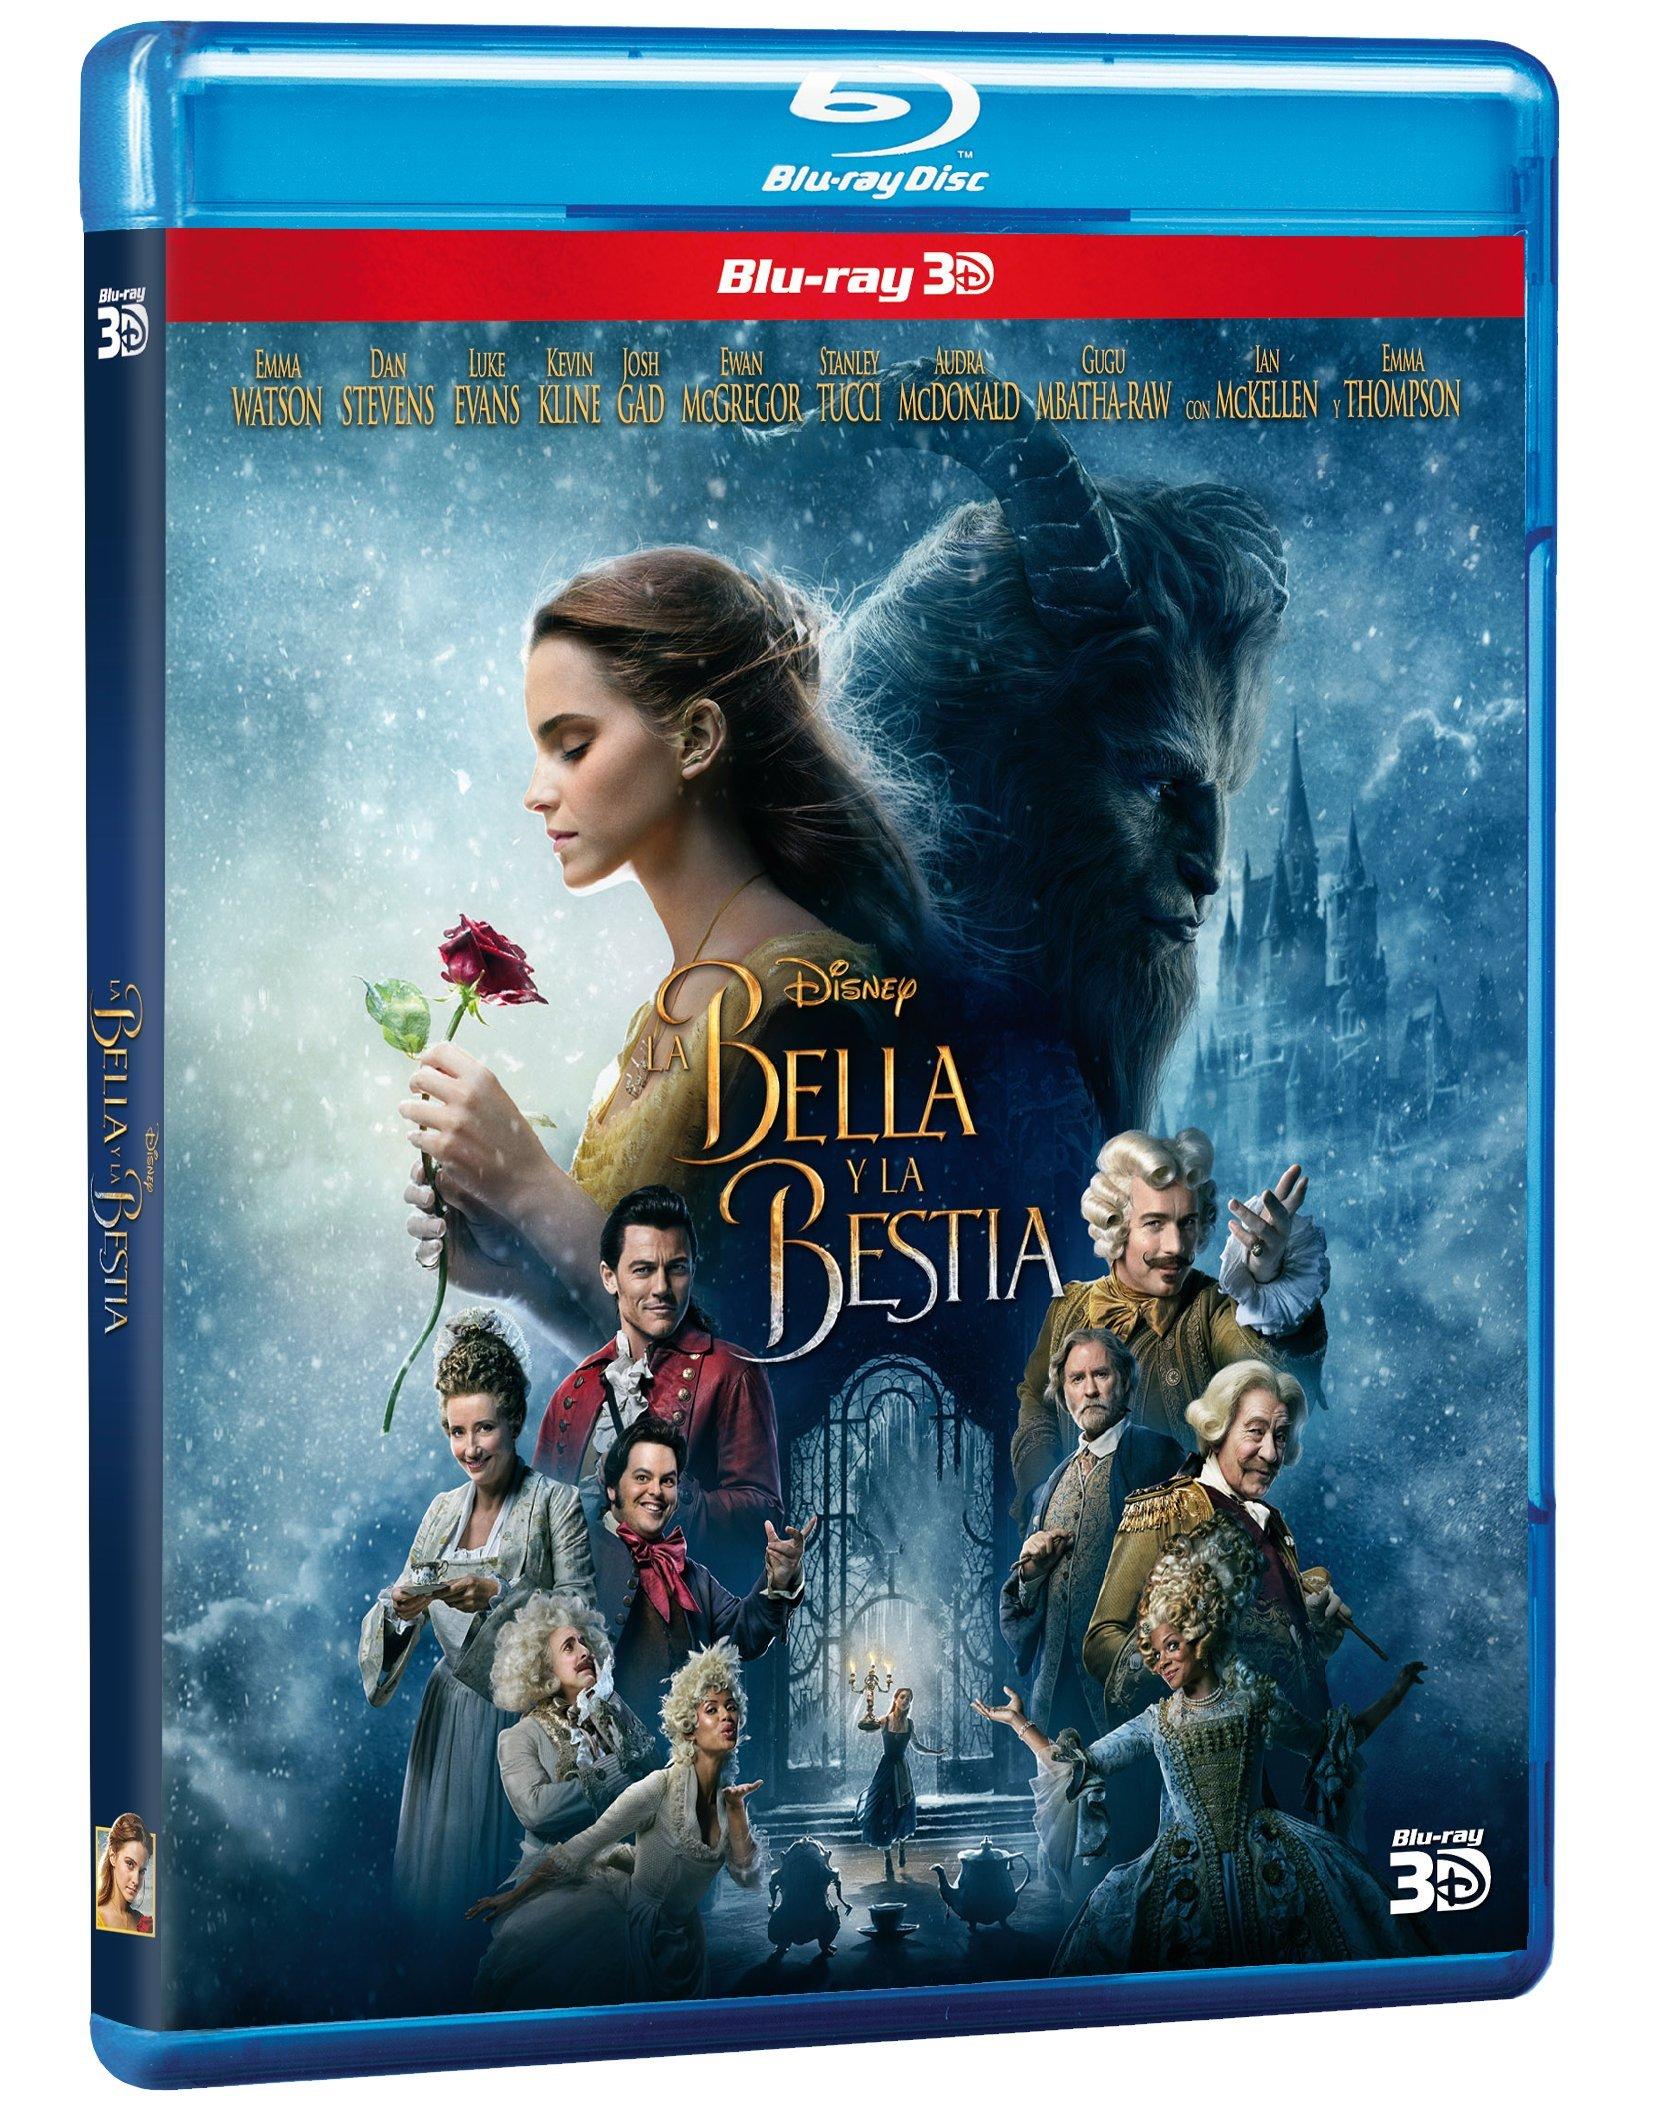 La Bella y La Bestia (Beauty and The Beast) BLU-RAY 3D - Starring Emma Watson (Audio & Subtitles: English and Spanish) IMPORT